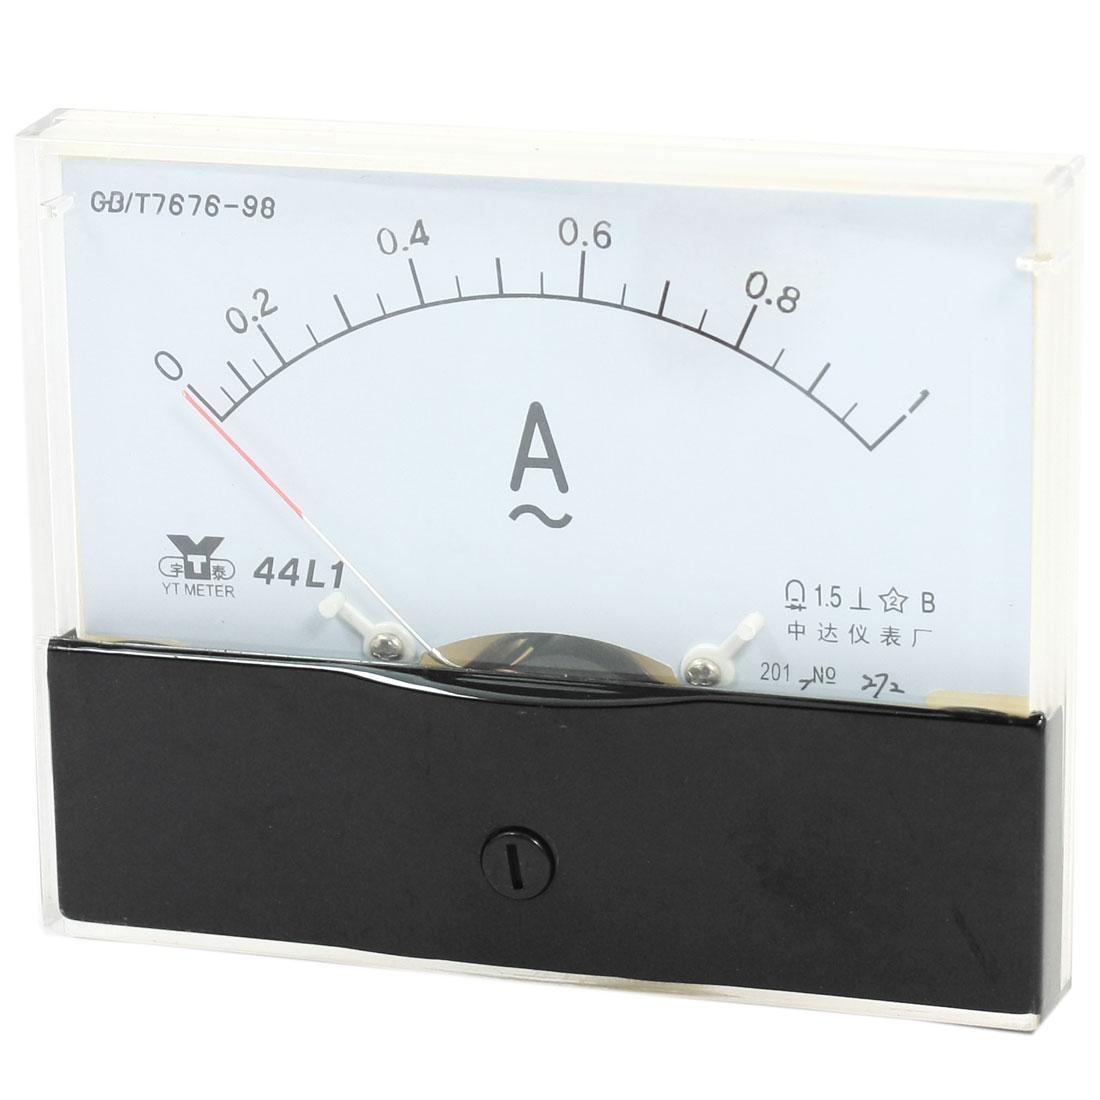 Measurement Tool Panel Mount Analog Ammeter Gauge AC 0 - 1A Measuring Range 44L1